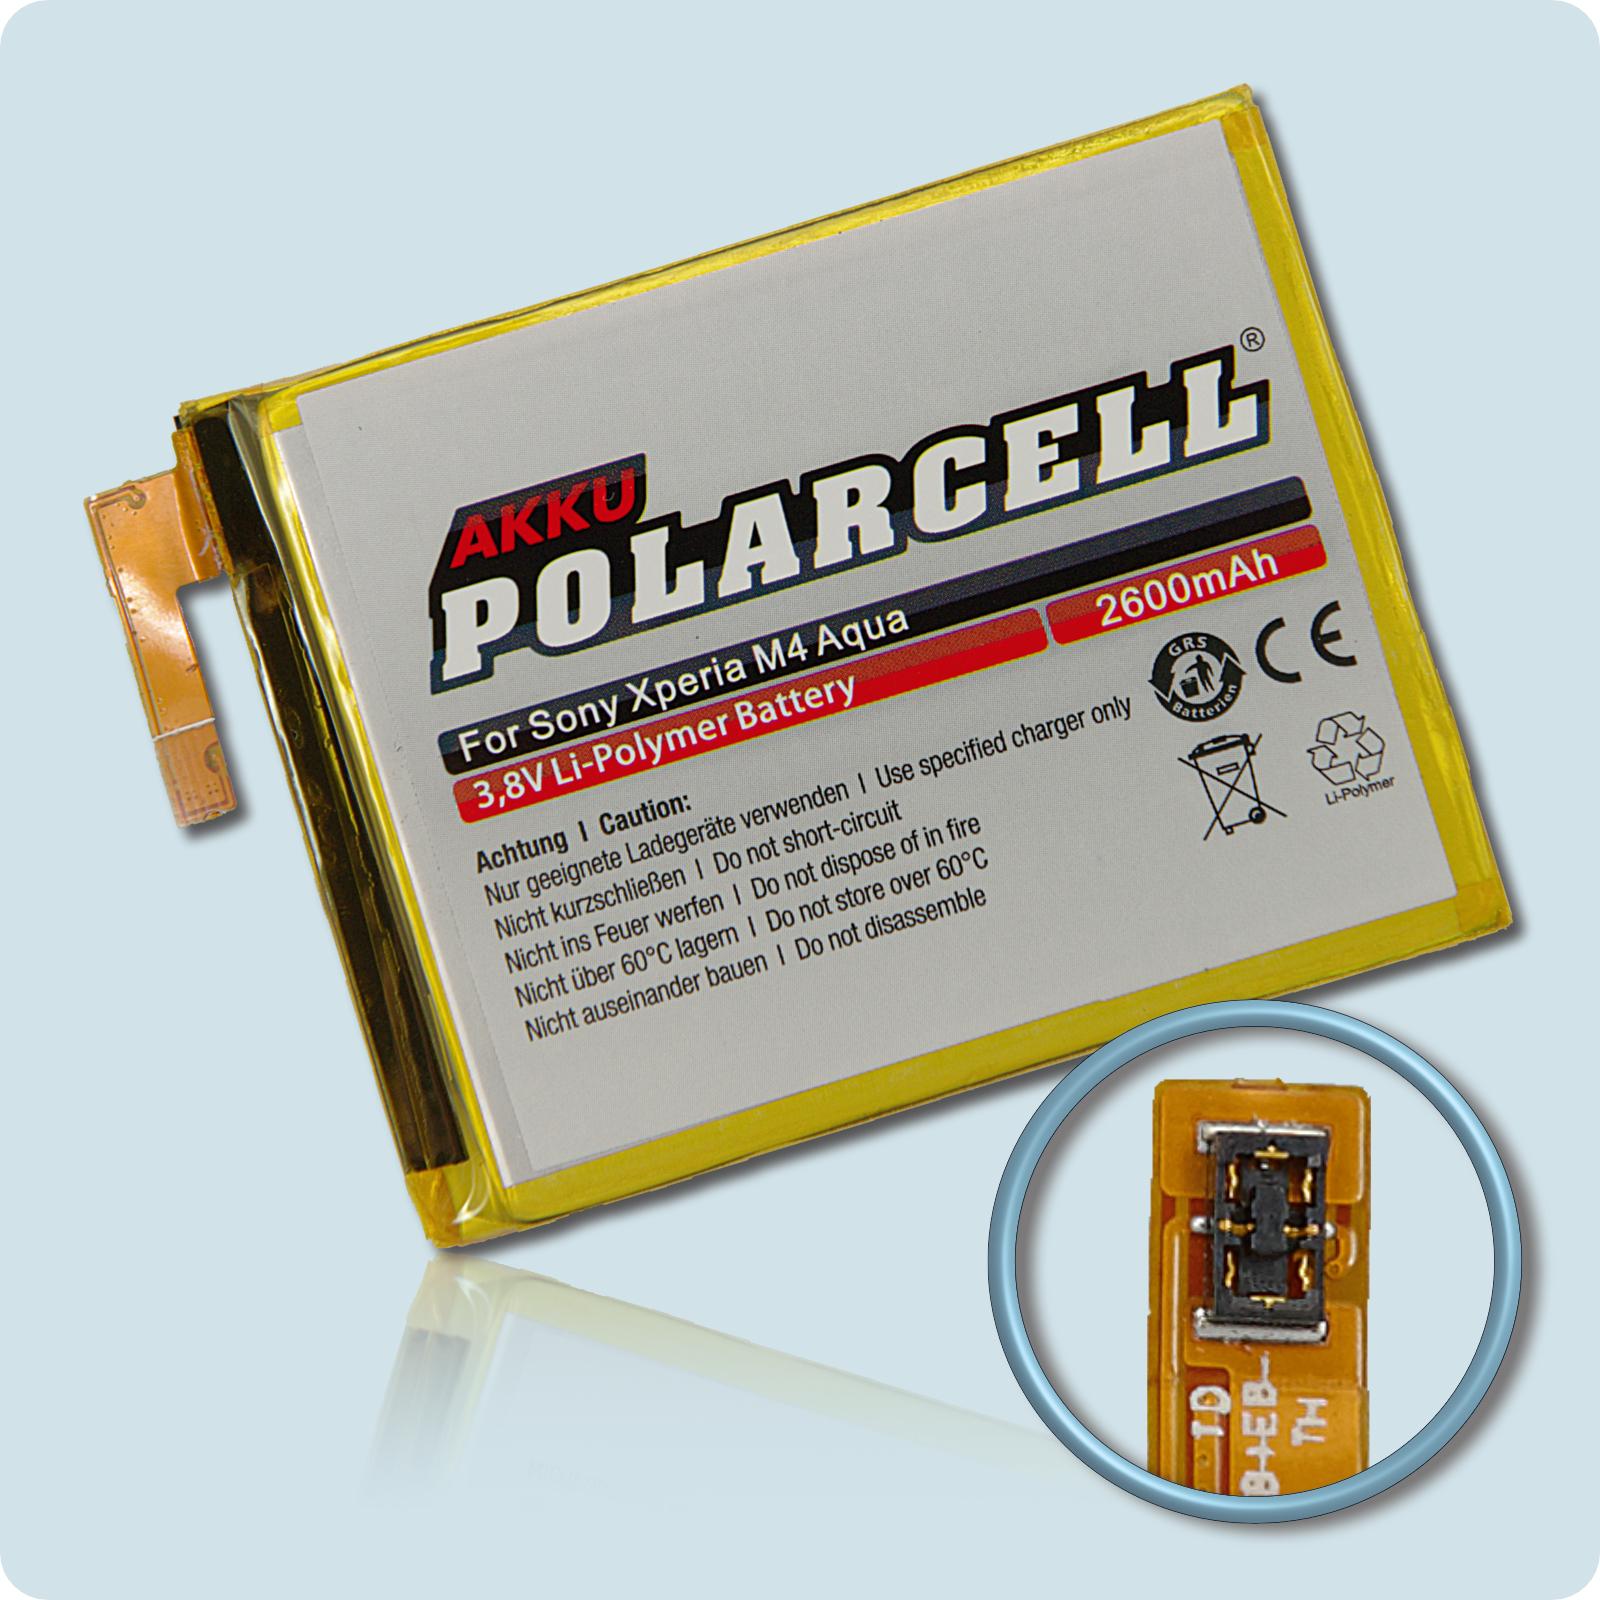 PolarCell® Hochleistungsakku für Sony Xperia M4 Aqua, ersetzt Originalakku LIS1576ERPC